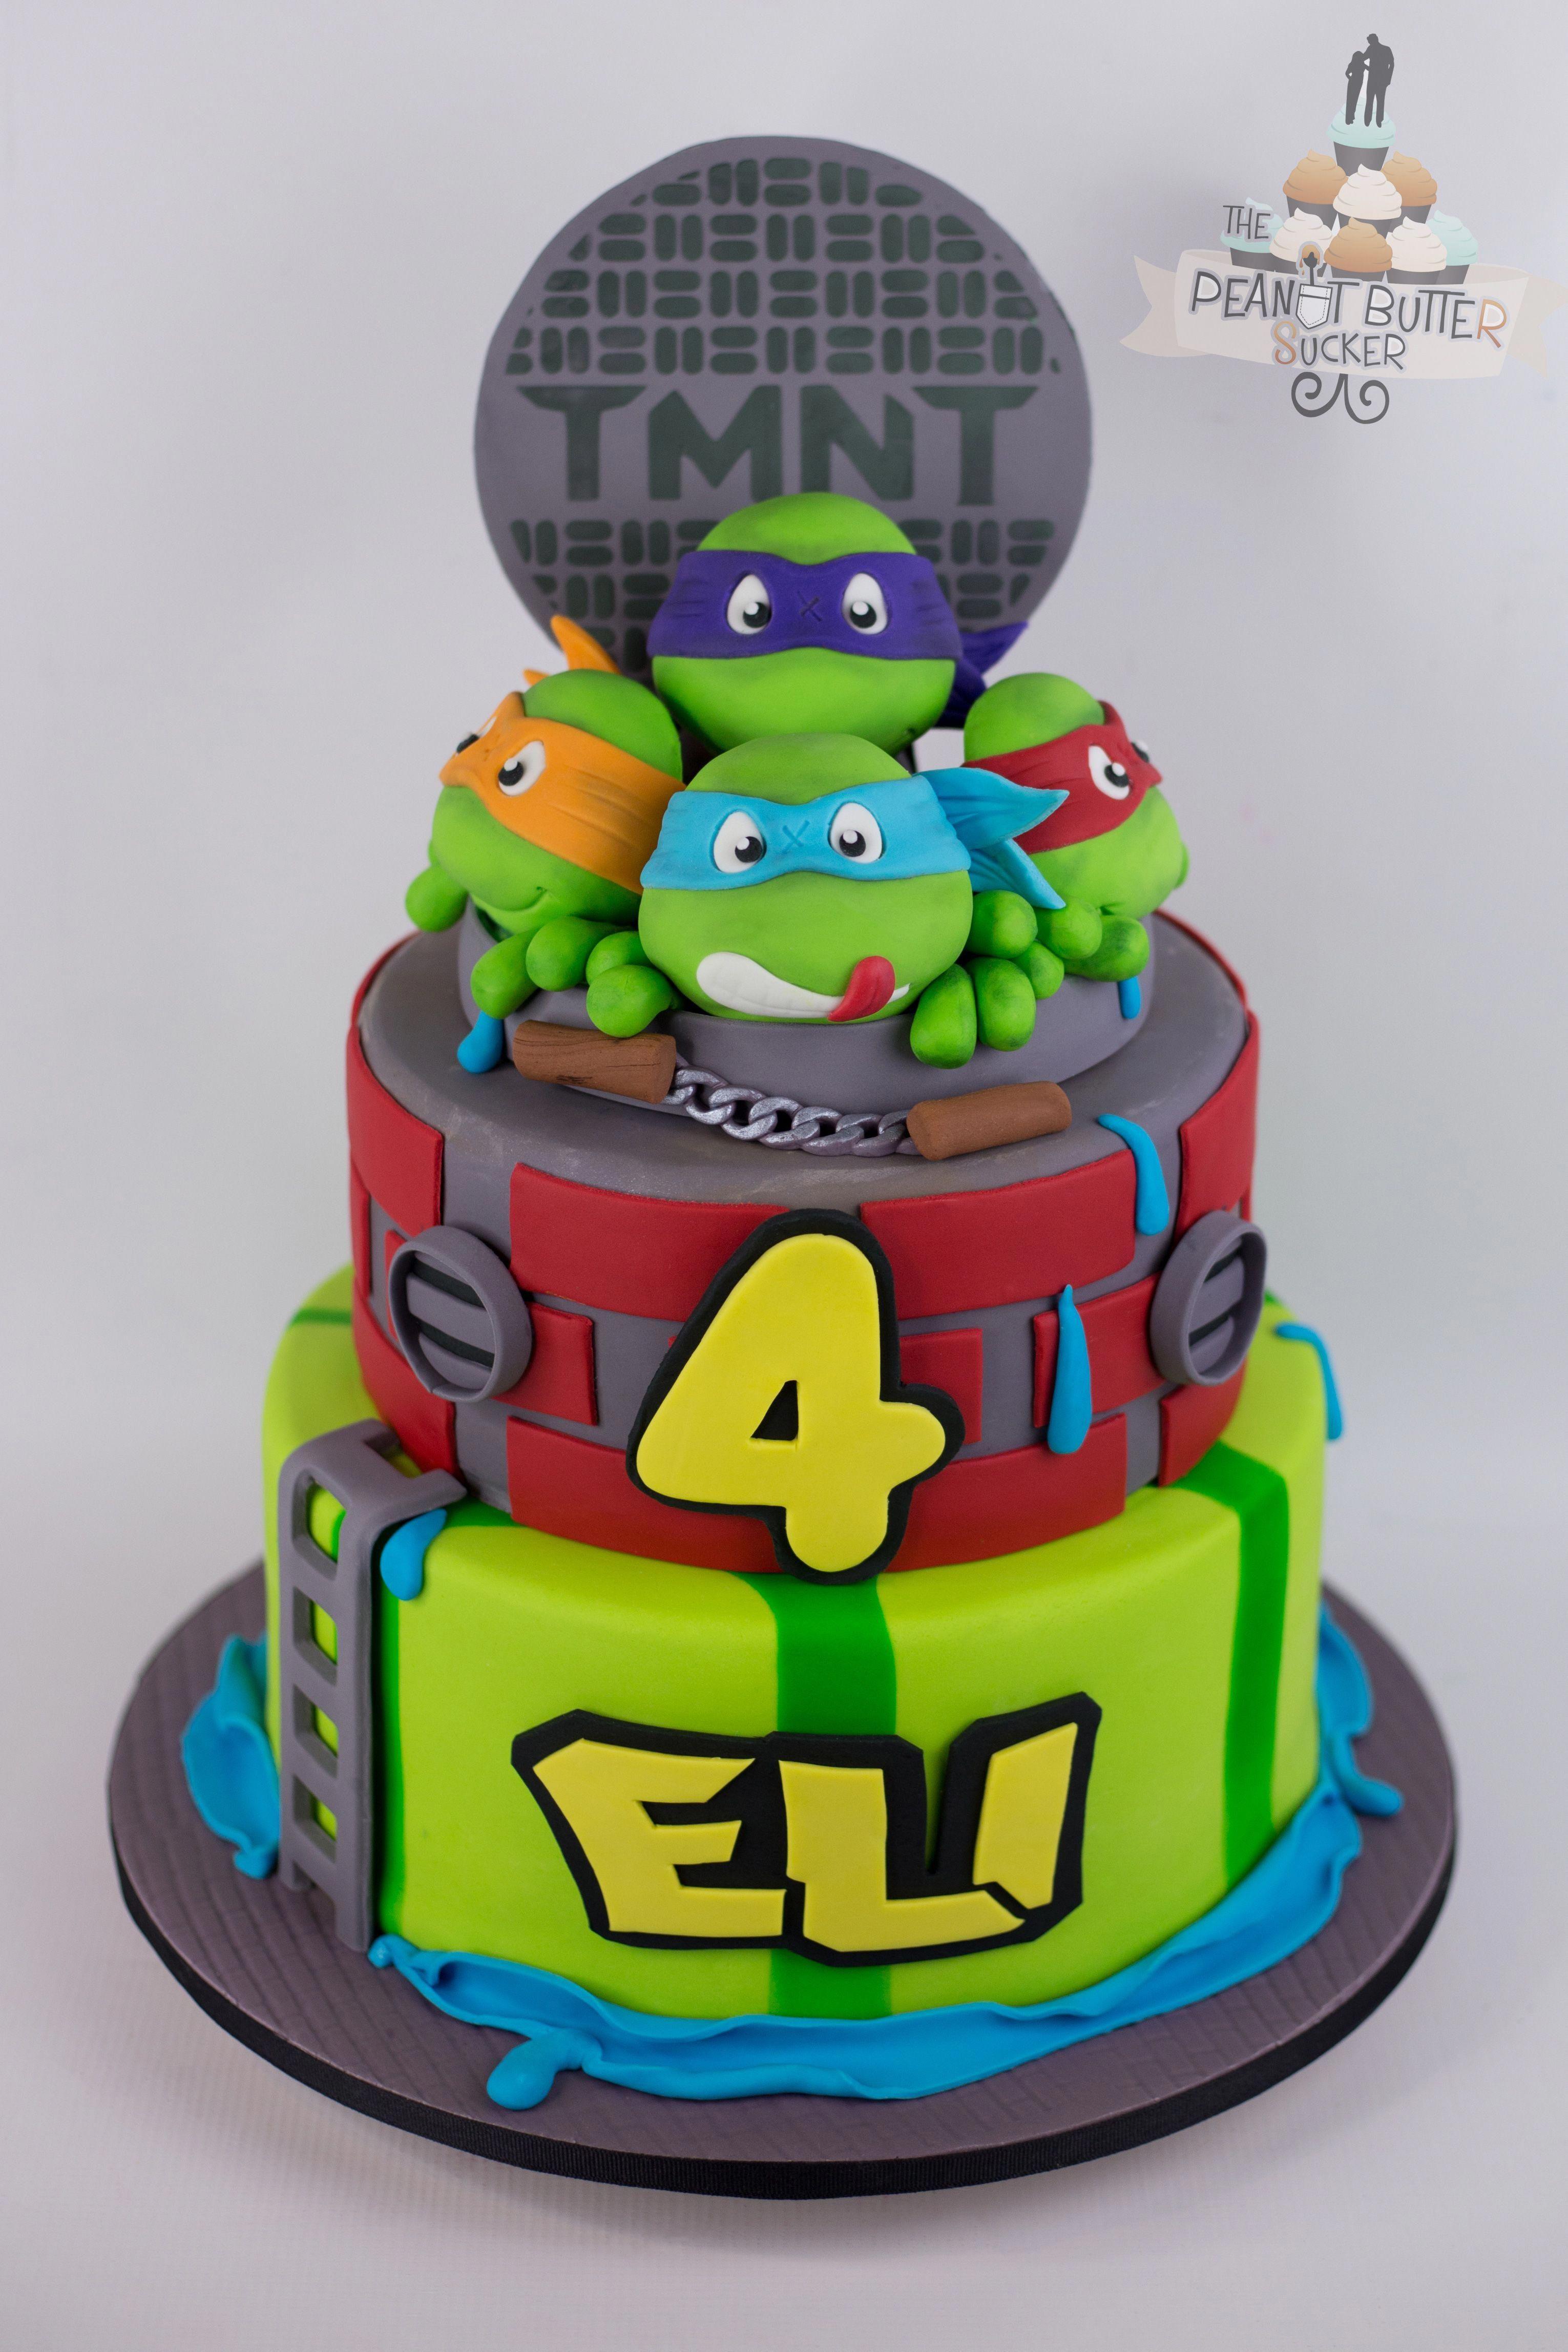 Ninja Turtle Cake Turtlecake Ninja Turtle Cake Ninja Turtle Birthday Cake Turtle Cake